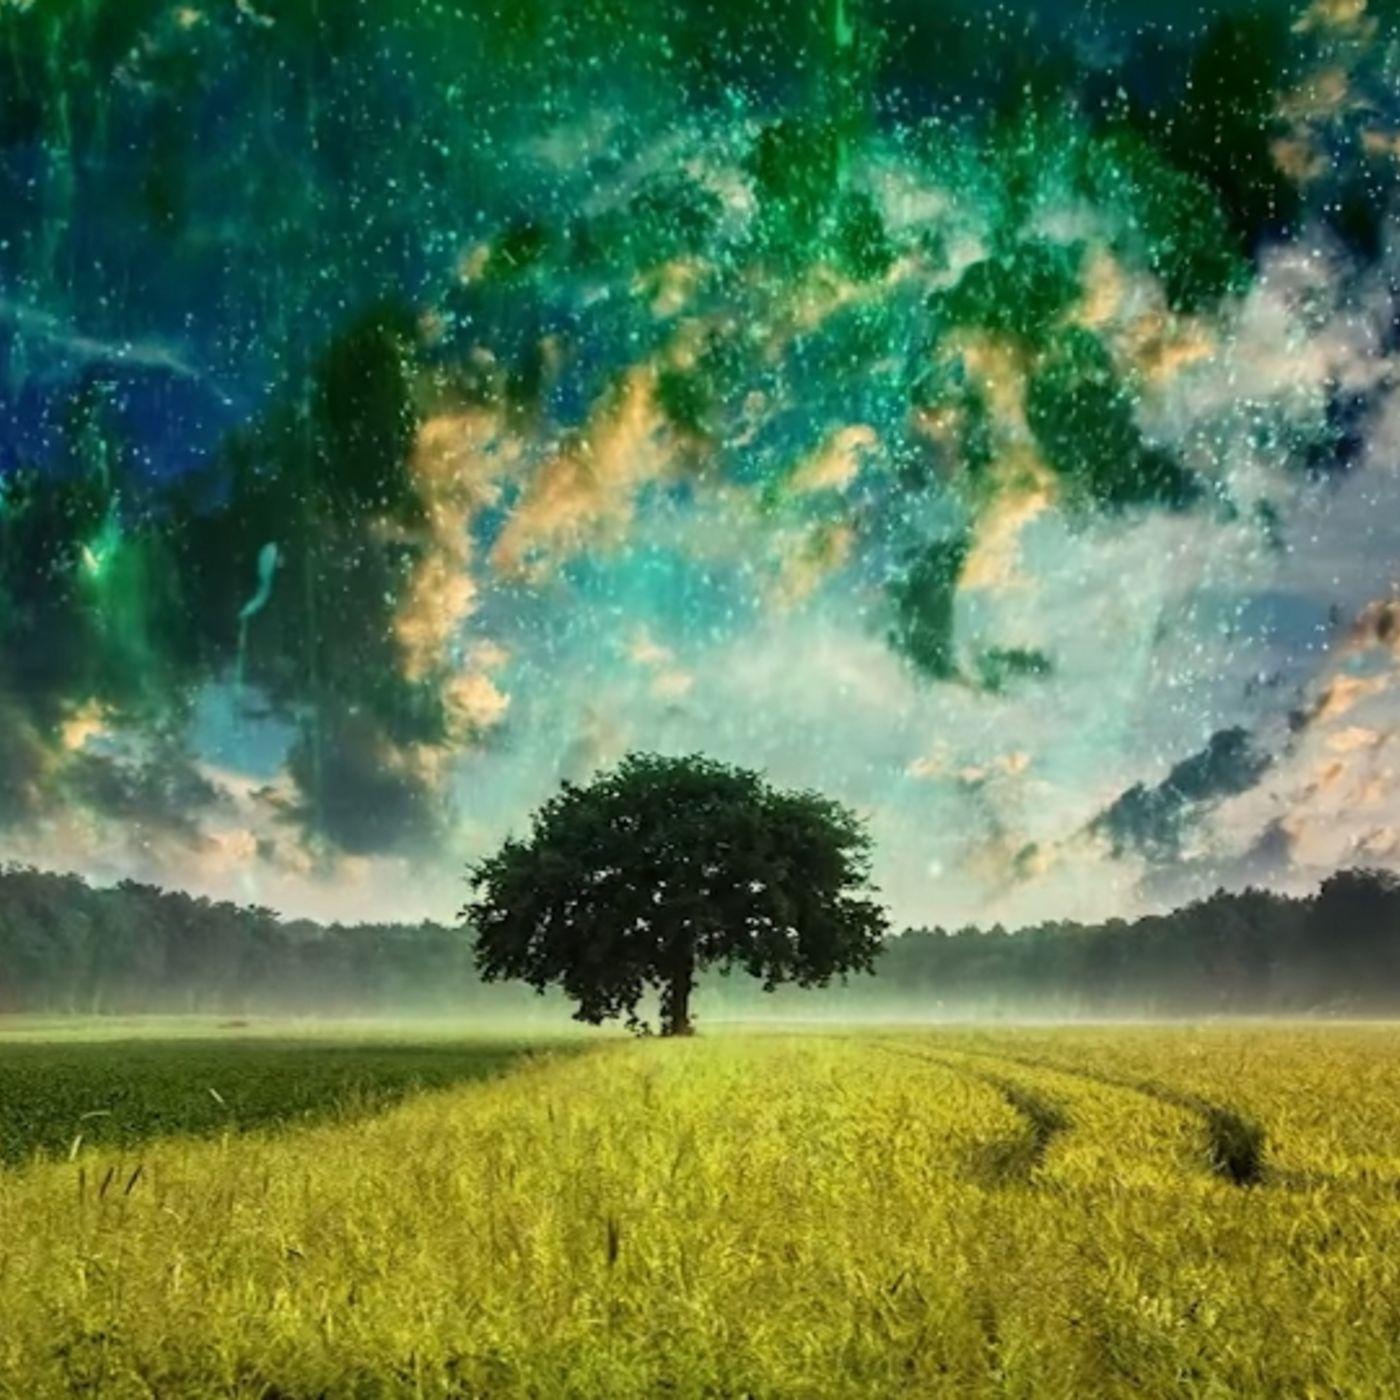 Earth Energy Illumination News for Jan 27th - Feb 4th